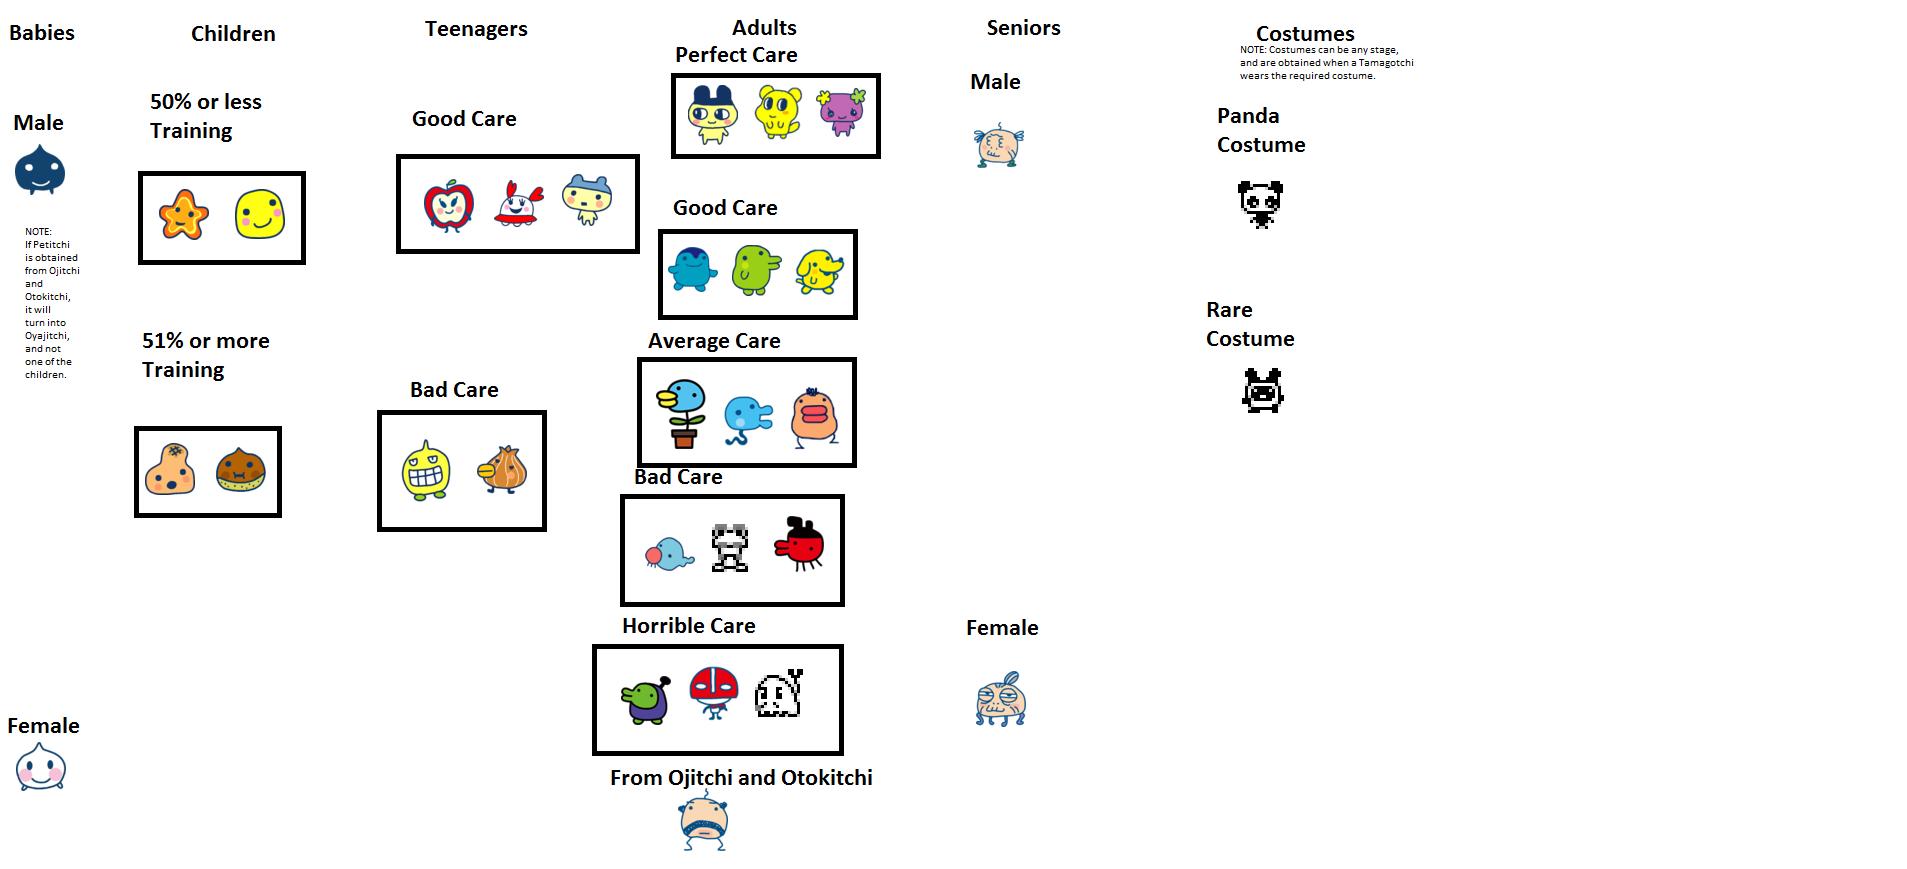 Image Tamagotchi Connection V2 Odd Generation Growth Chartg